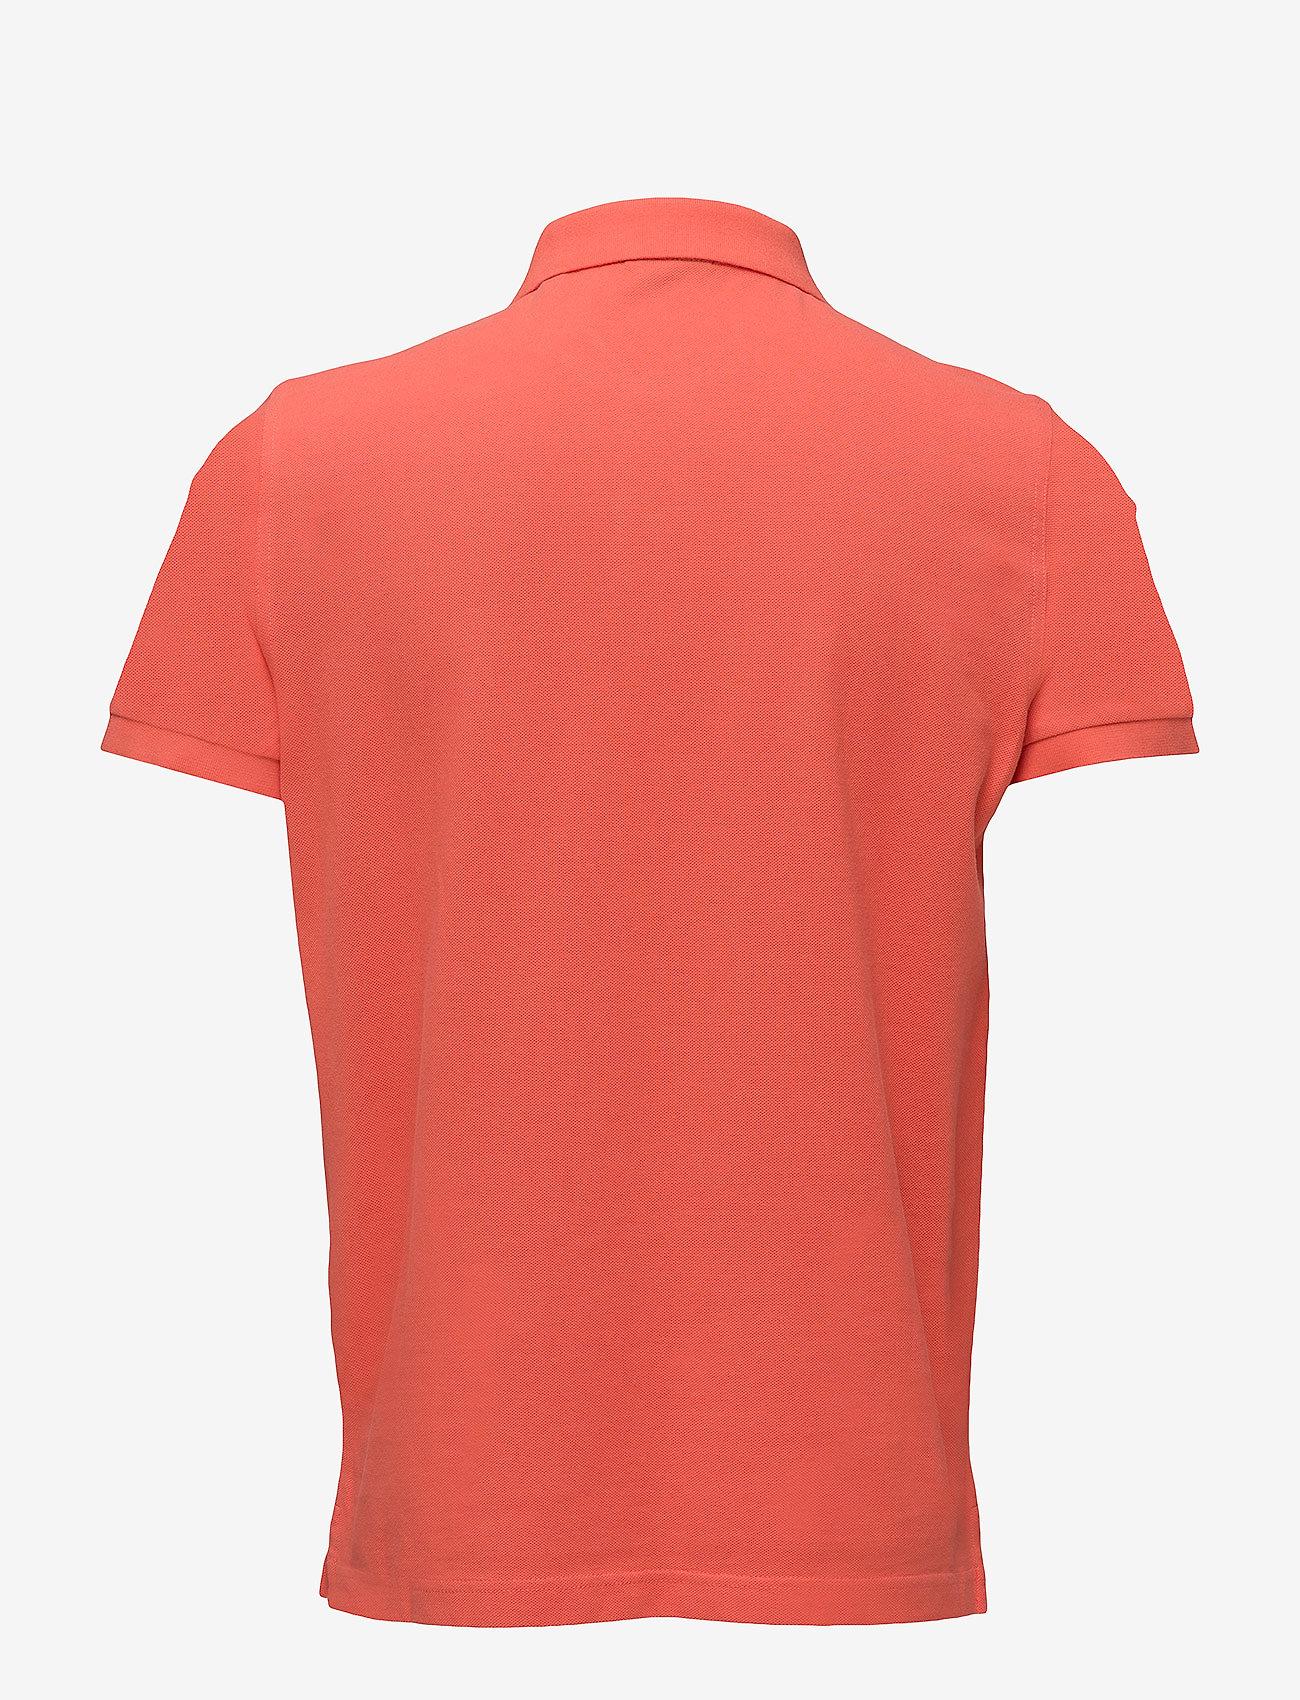 Gant - ORIGINAL PIQUE SS RUGGER - short-sleeved polos - strong coral